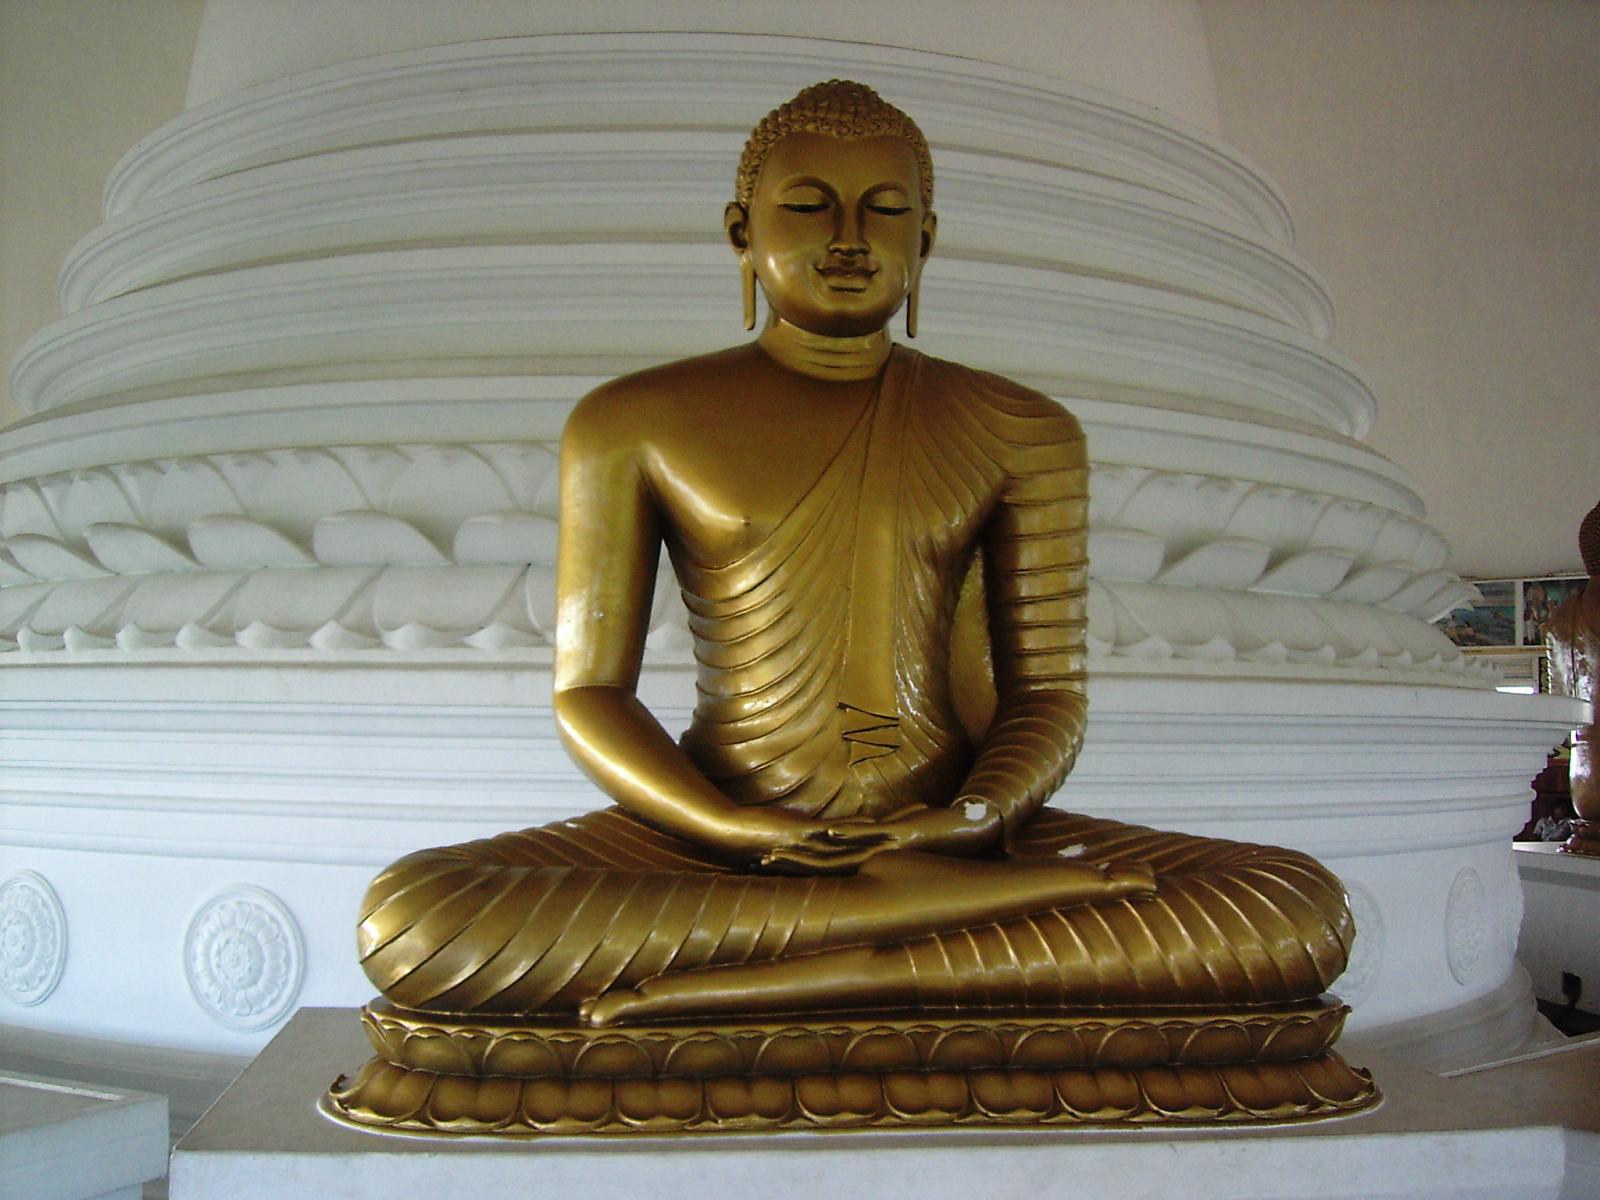 Lord Buddha in Sri Lanka - Kalutara